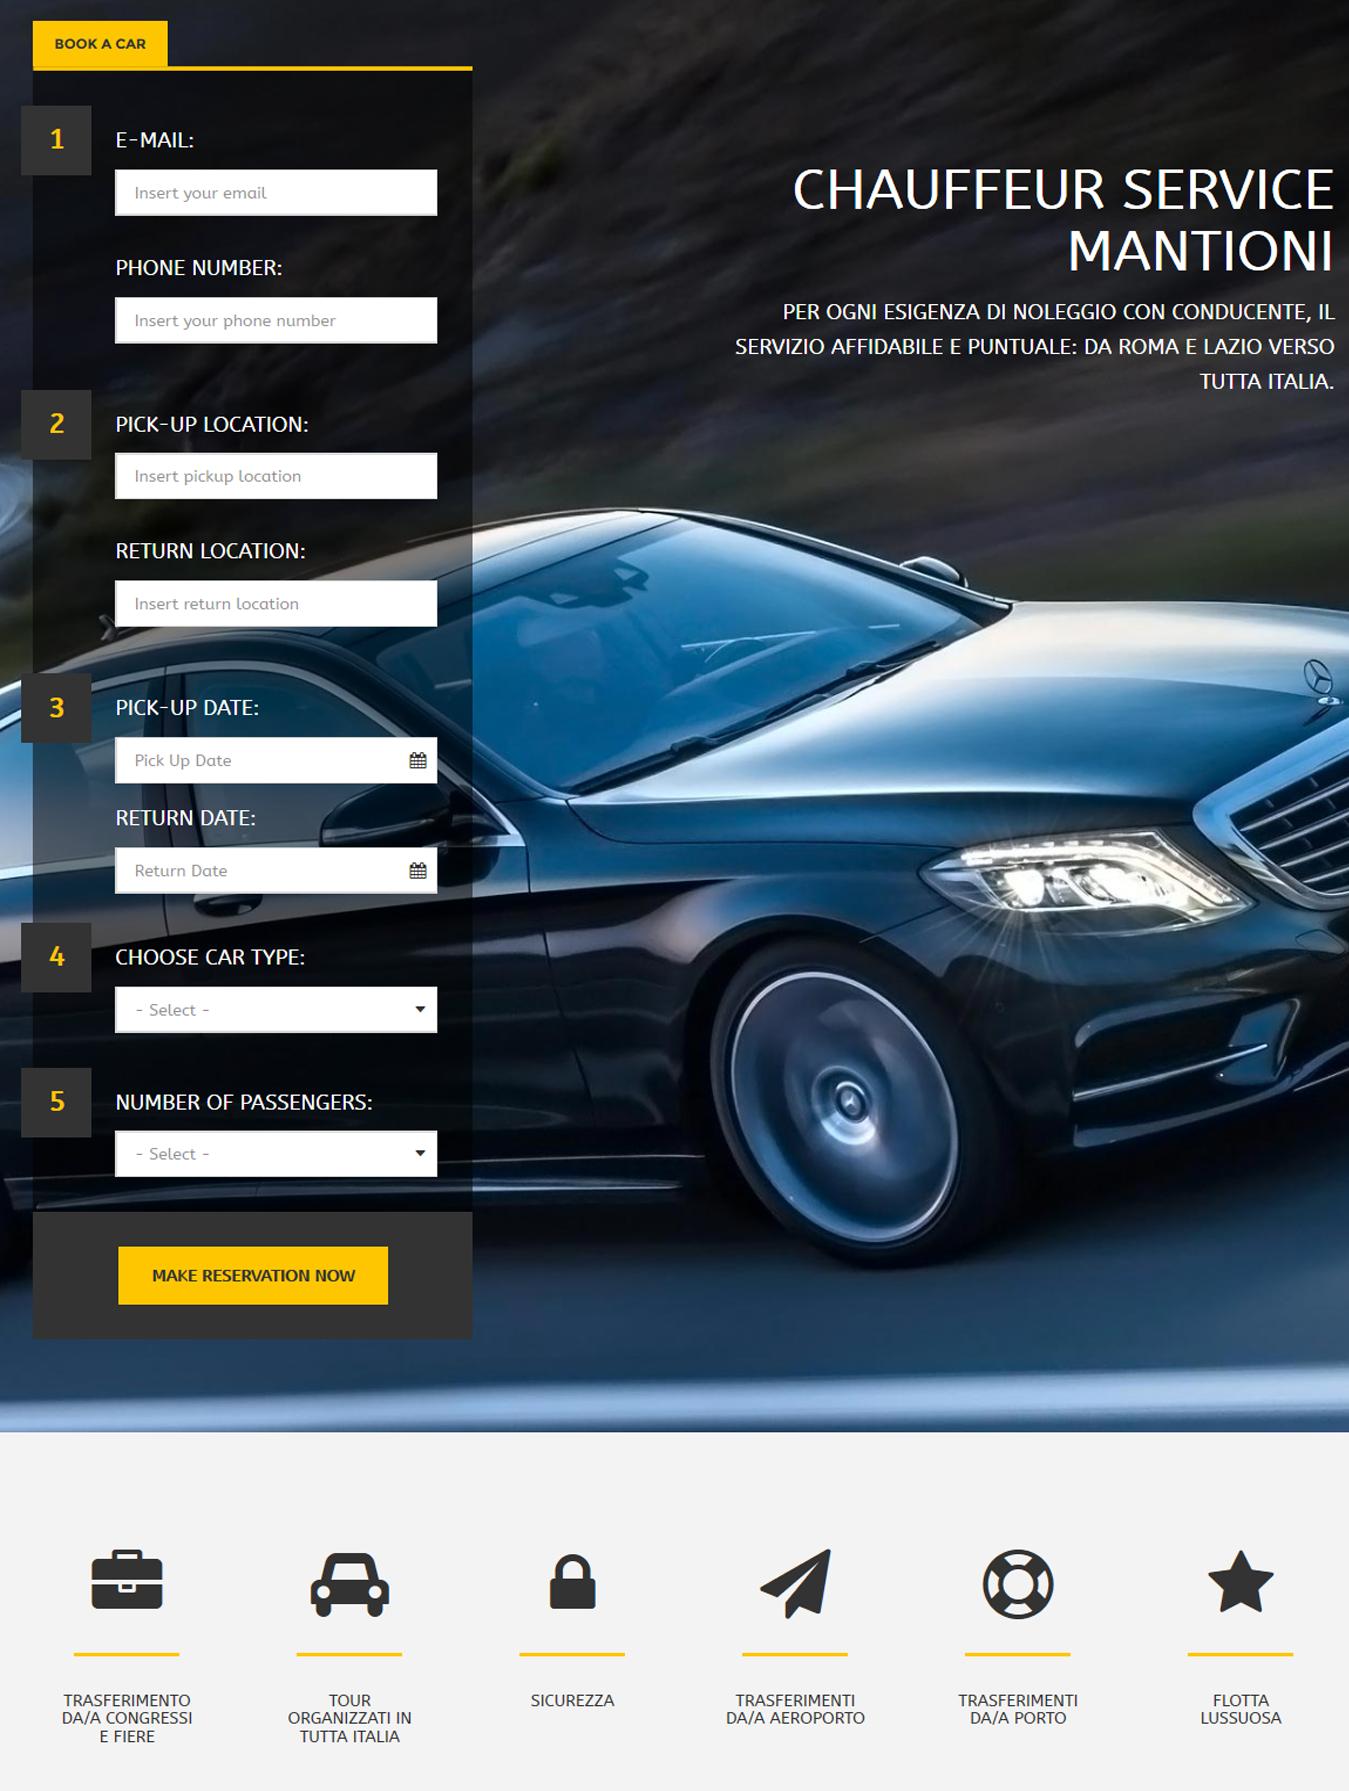 Chauffeur Service Mantioni